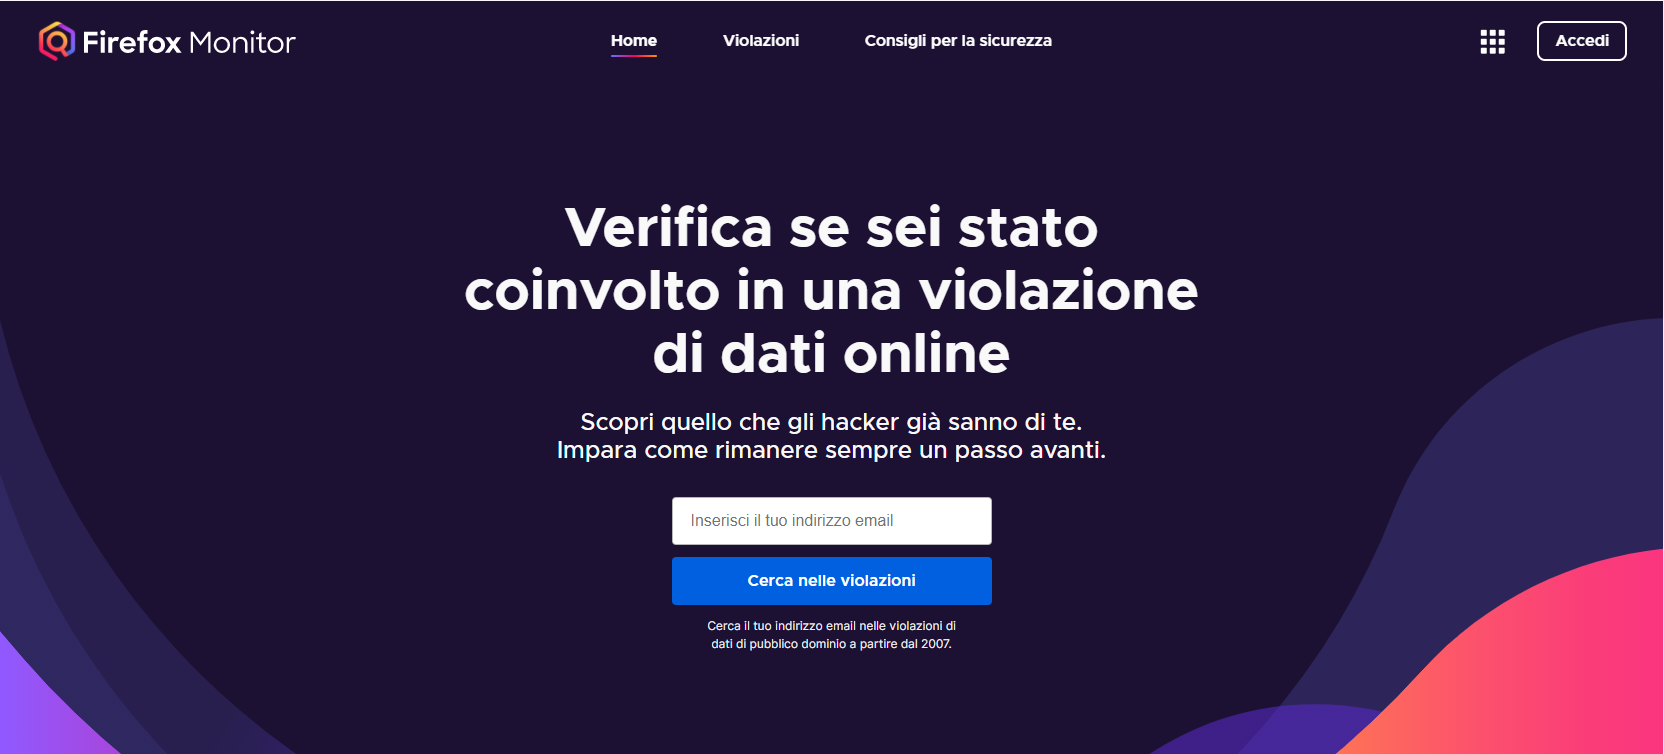 Firefox Monitor screenshot